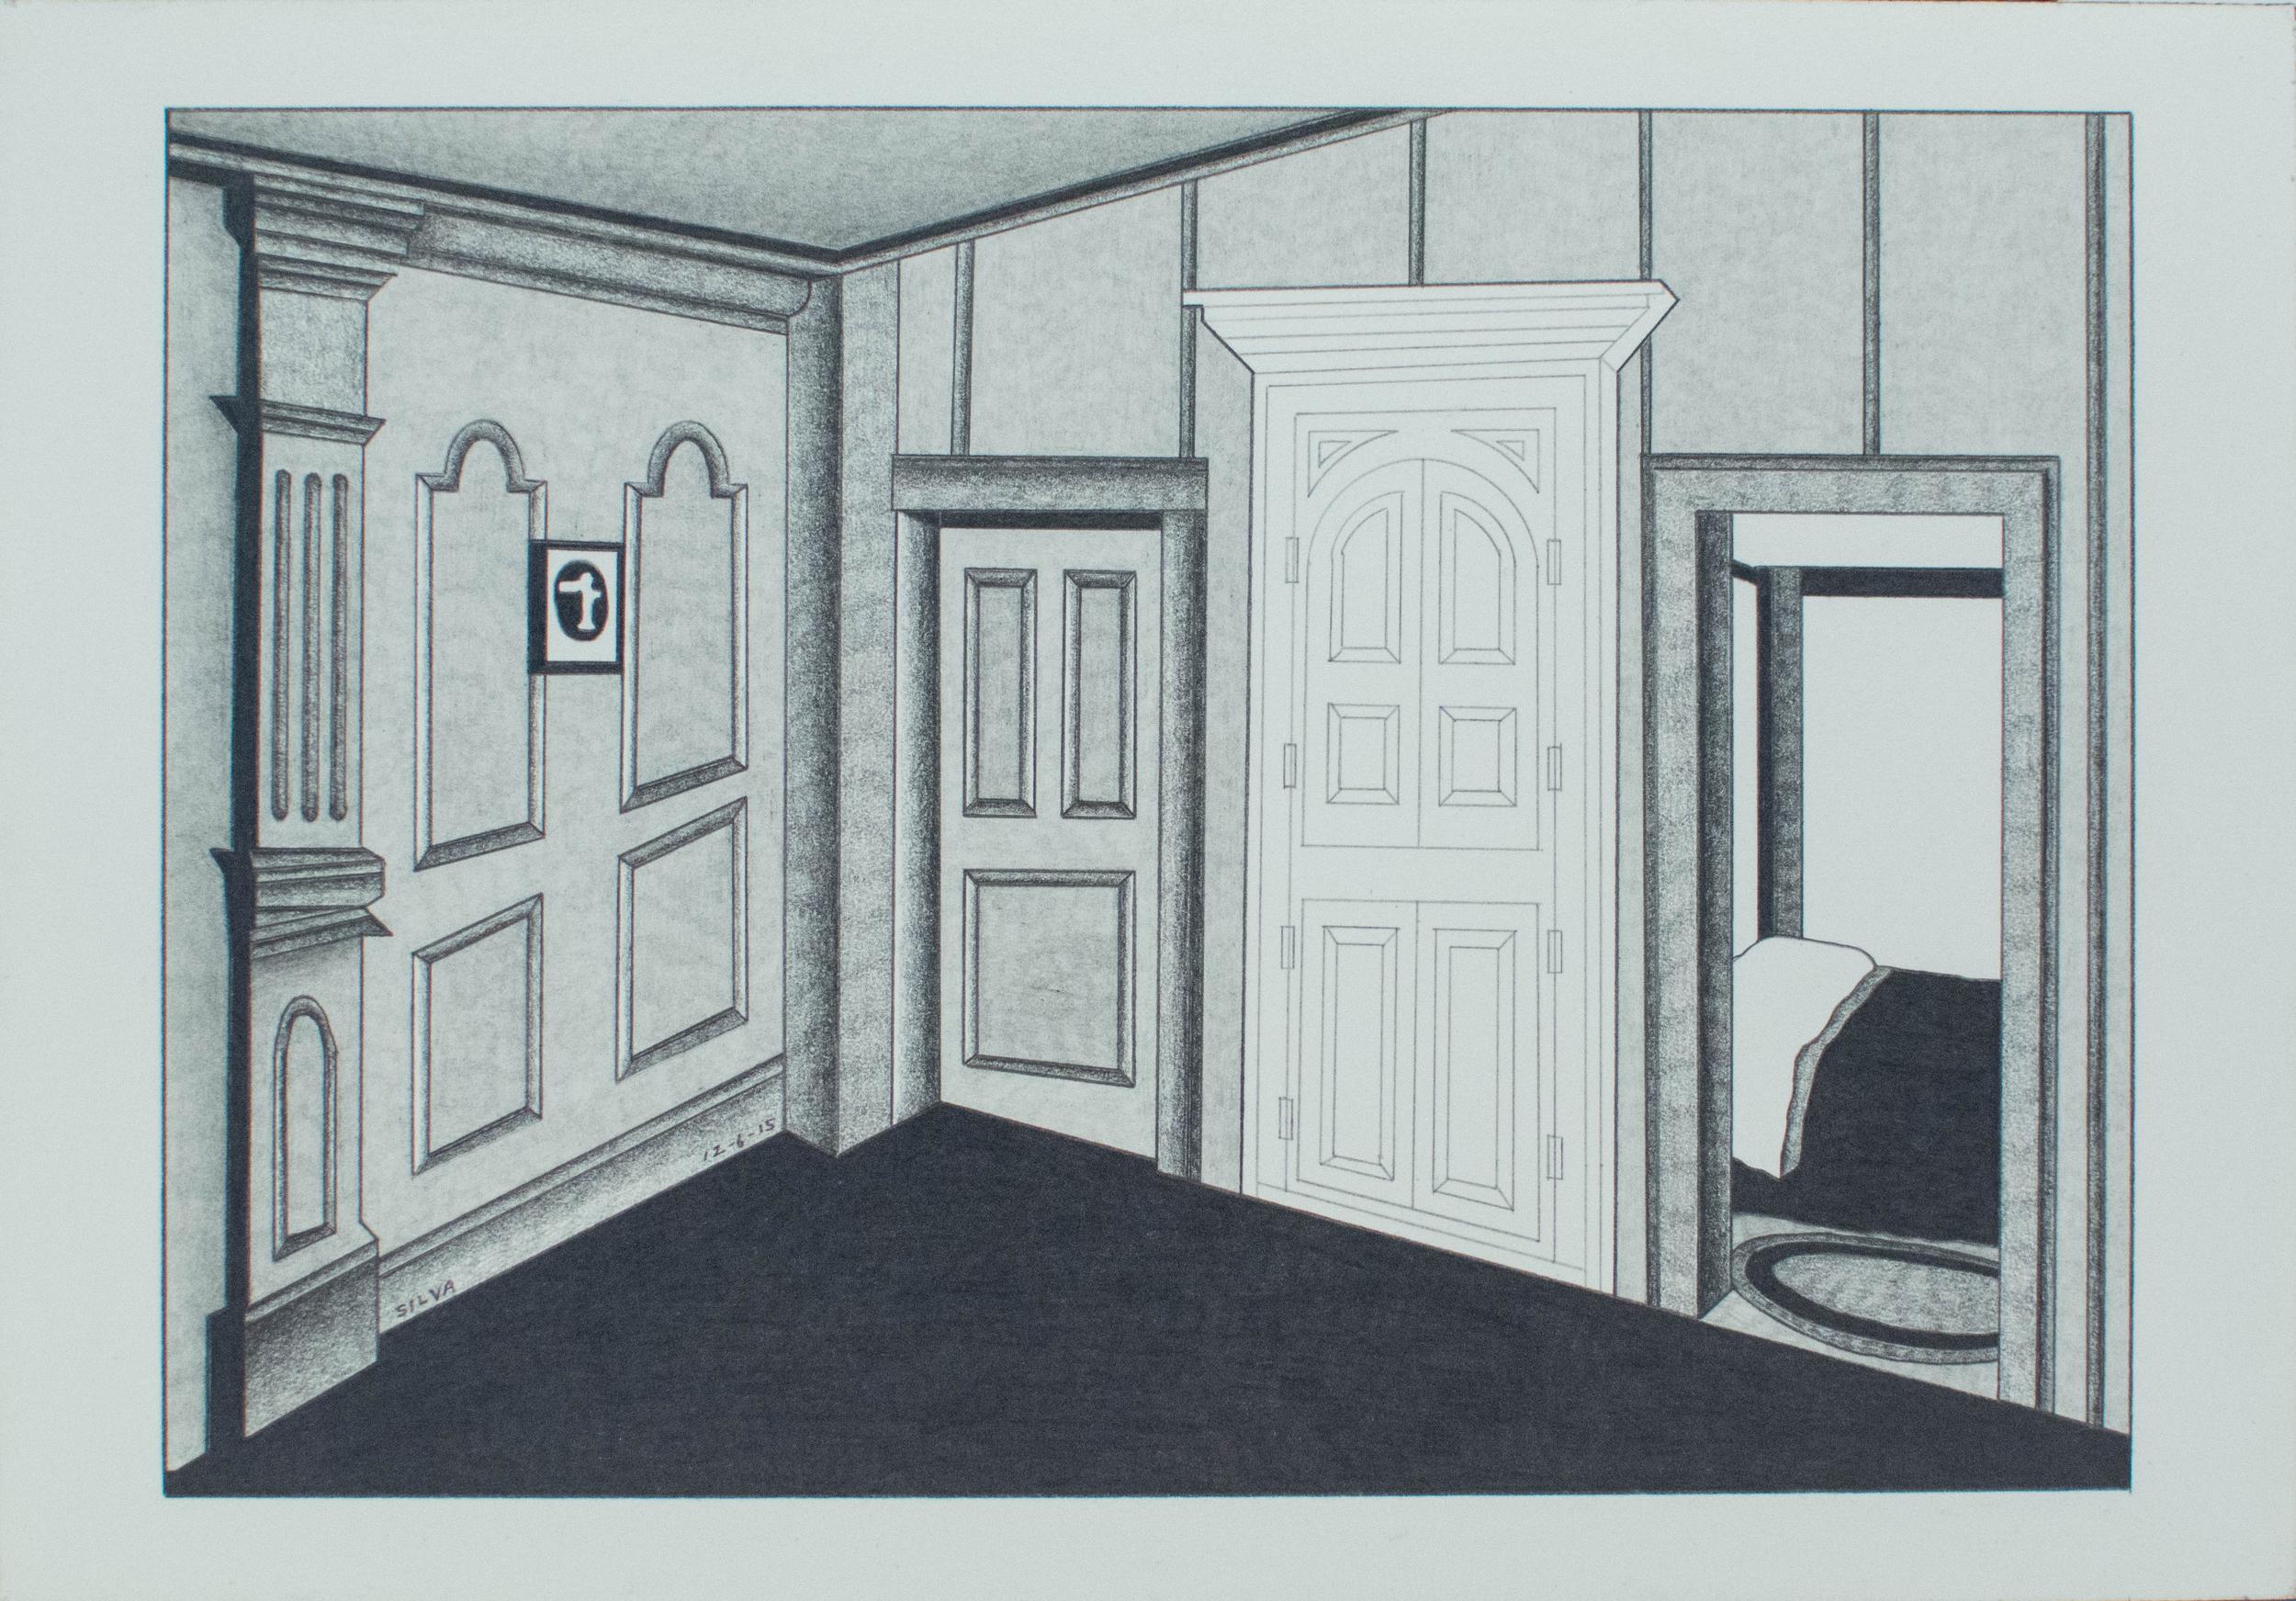 12-6-15, 2015, Graphite on paper, 7 x 10 inches